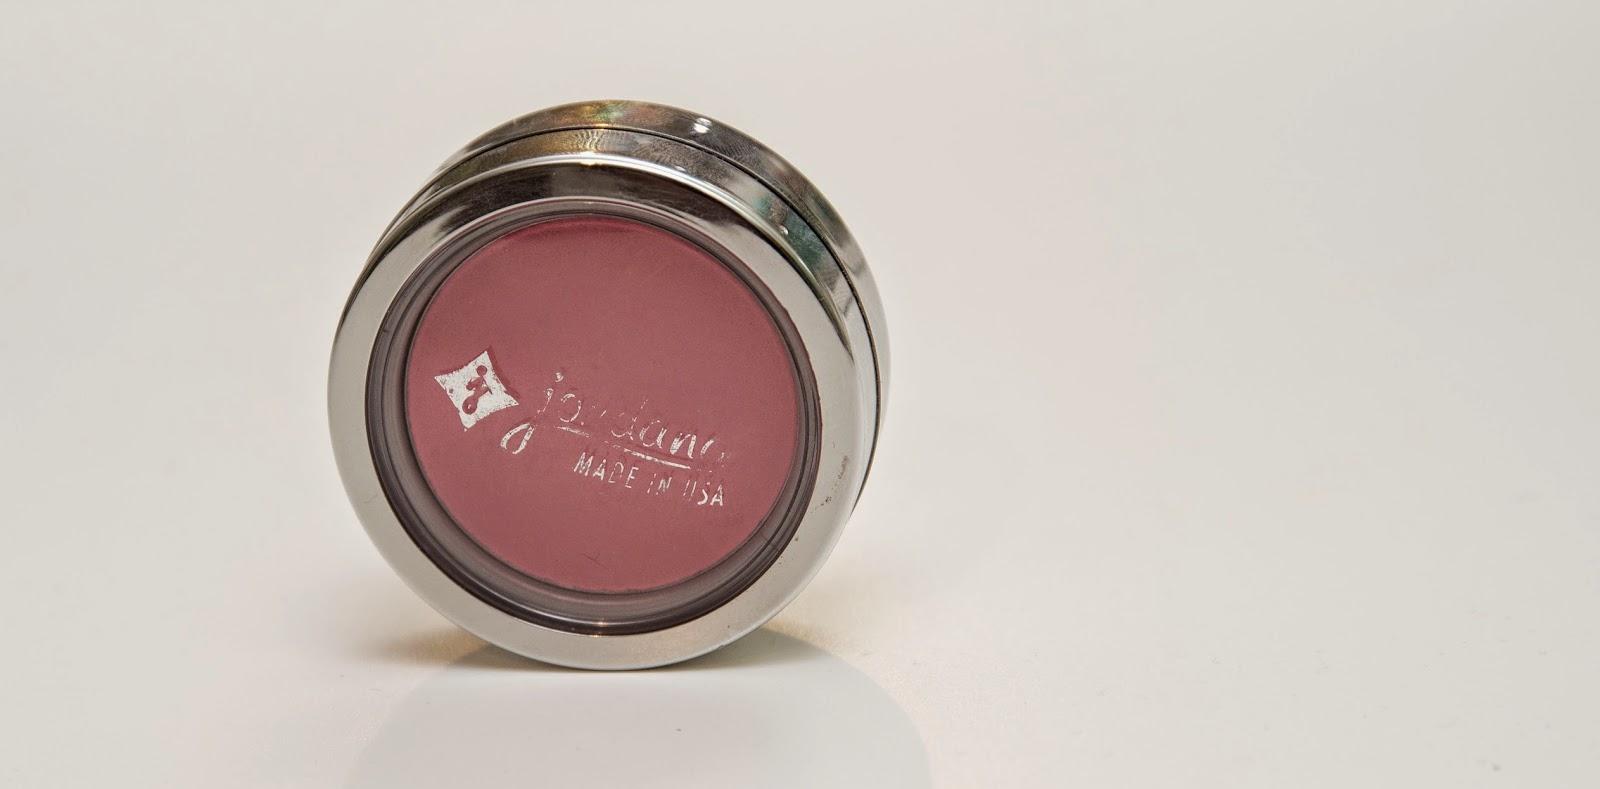 jordana cosmetics, levná kosmetika, kvalitní kosmetika, tvářenka, blush, face,